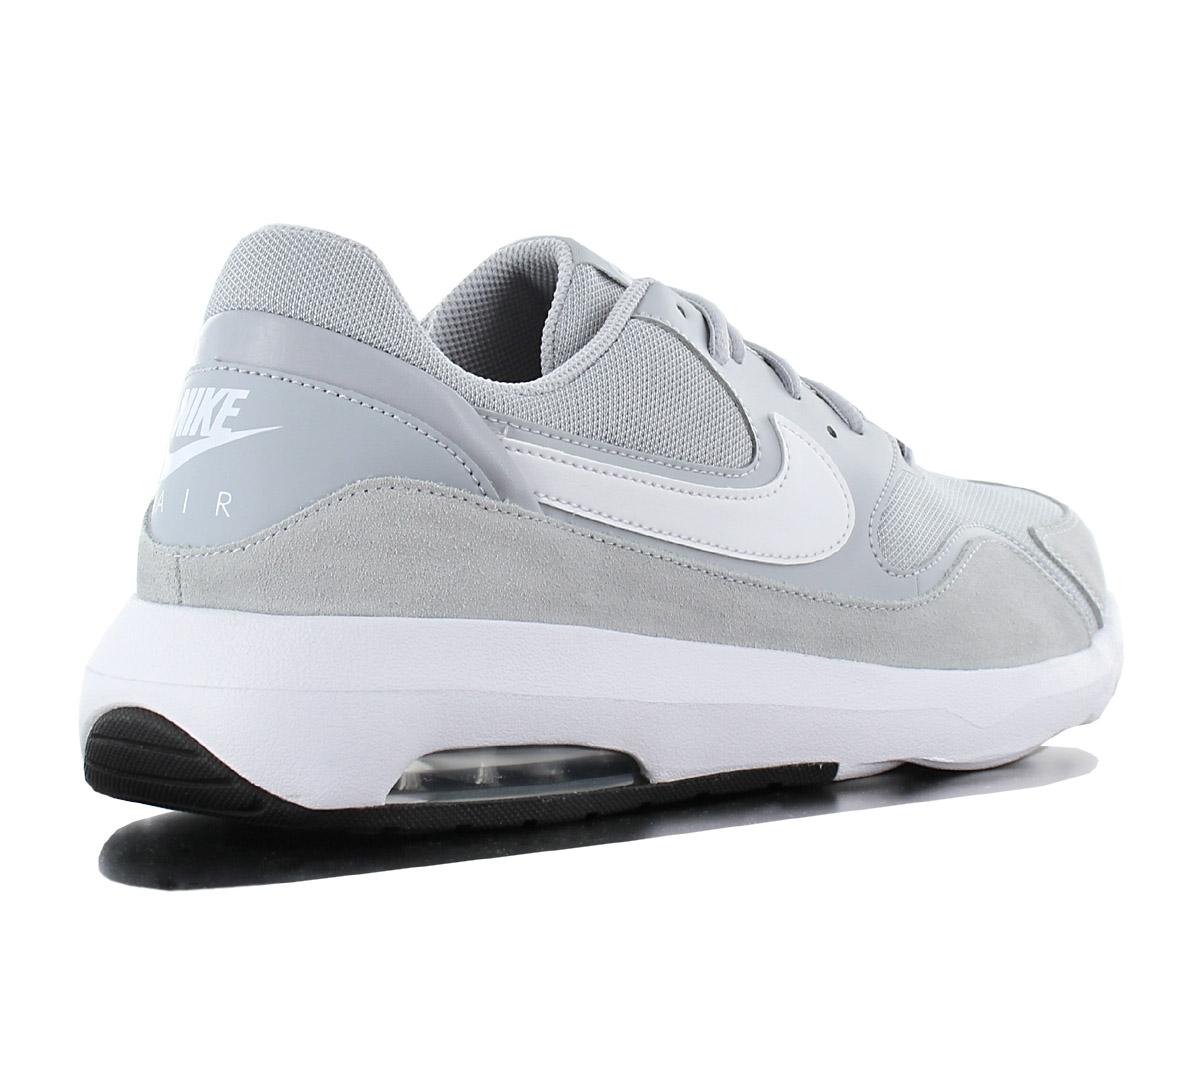 507bf4946e6 Nike Air Max Nostalgic Men s Sneakers Shoes Grey Classic 916781-001 ...